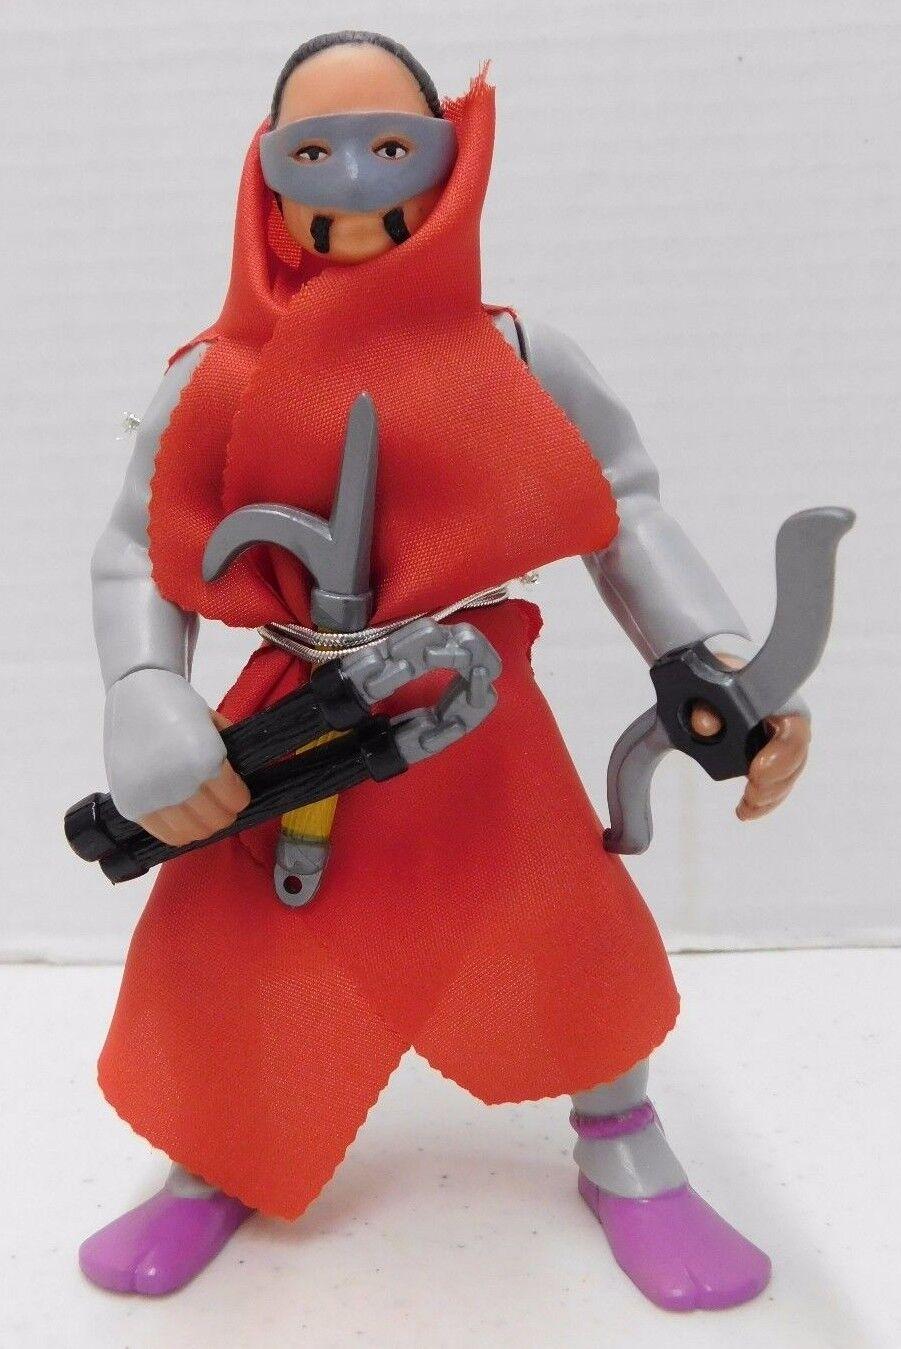 Ninja - krieger feinde des bösen scorpia - vintage - action - figur